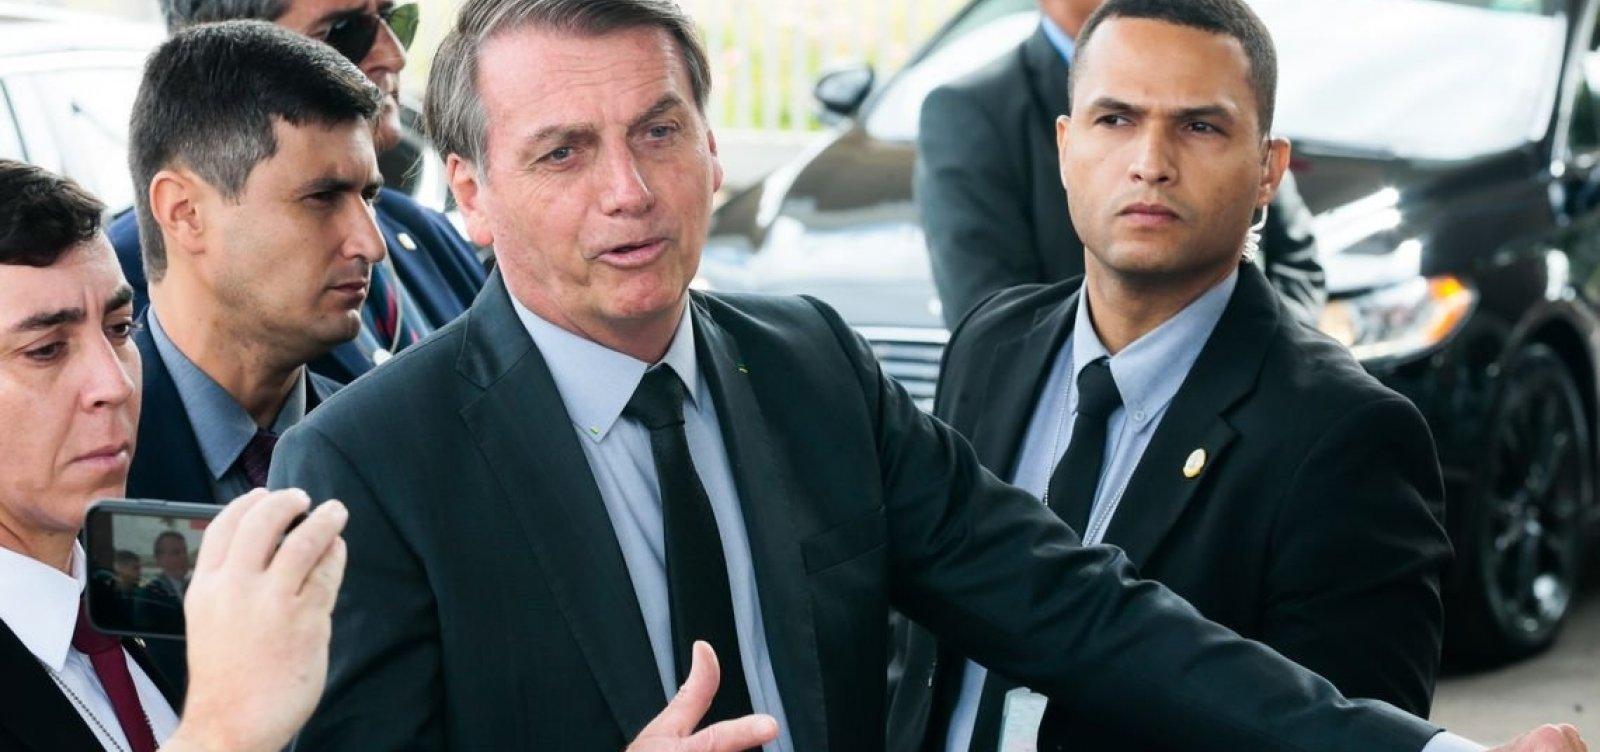 [Bolsonaro diz que enviará projeto que garante excludente de ilicitude em GLO]